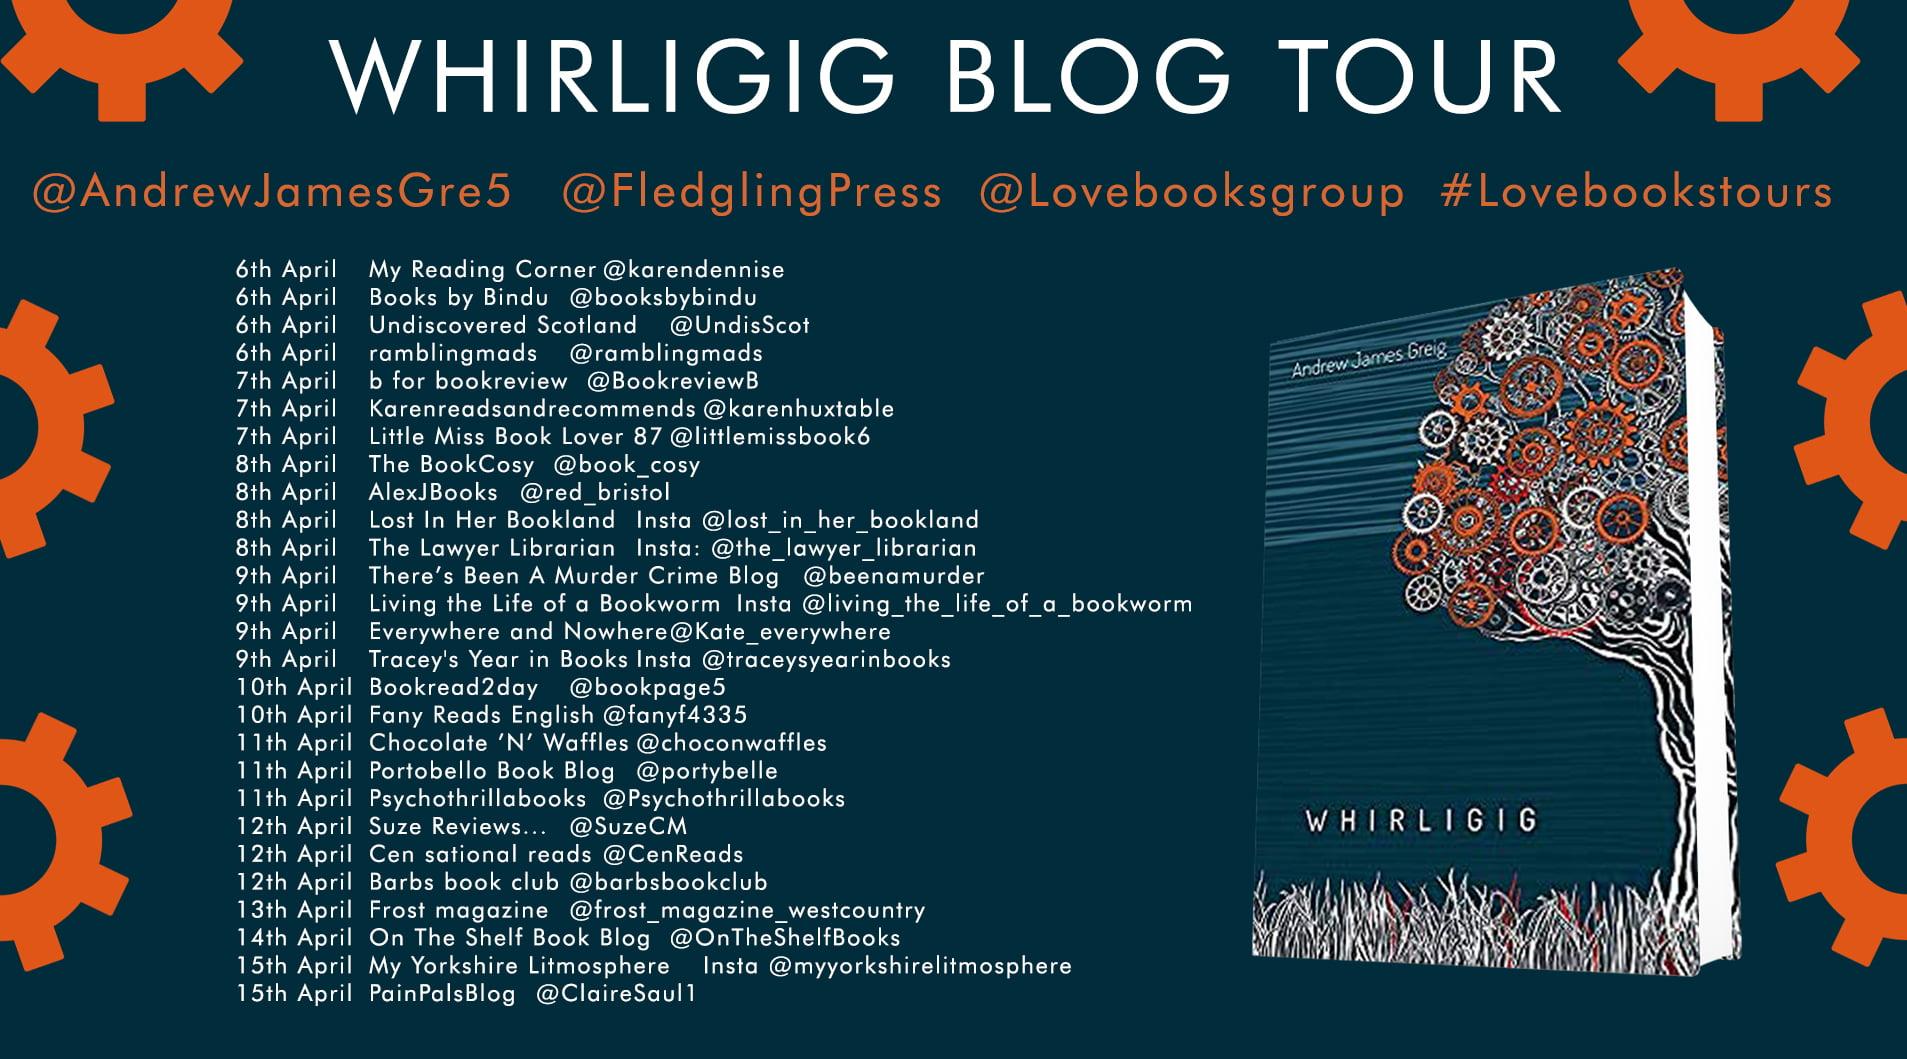 Whirligig – Andrew James Greig